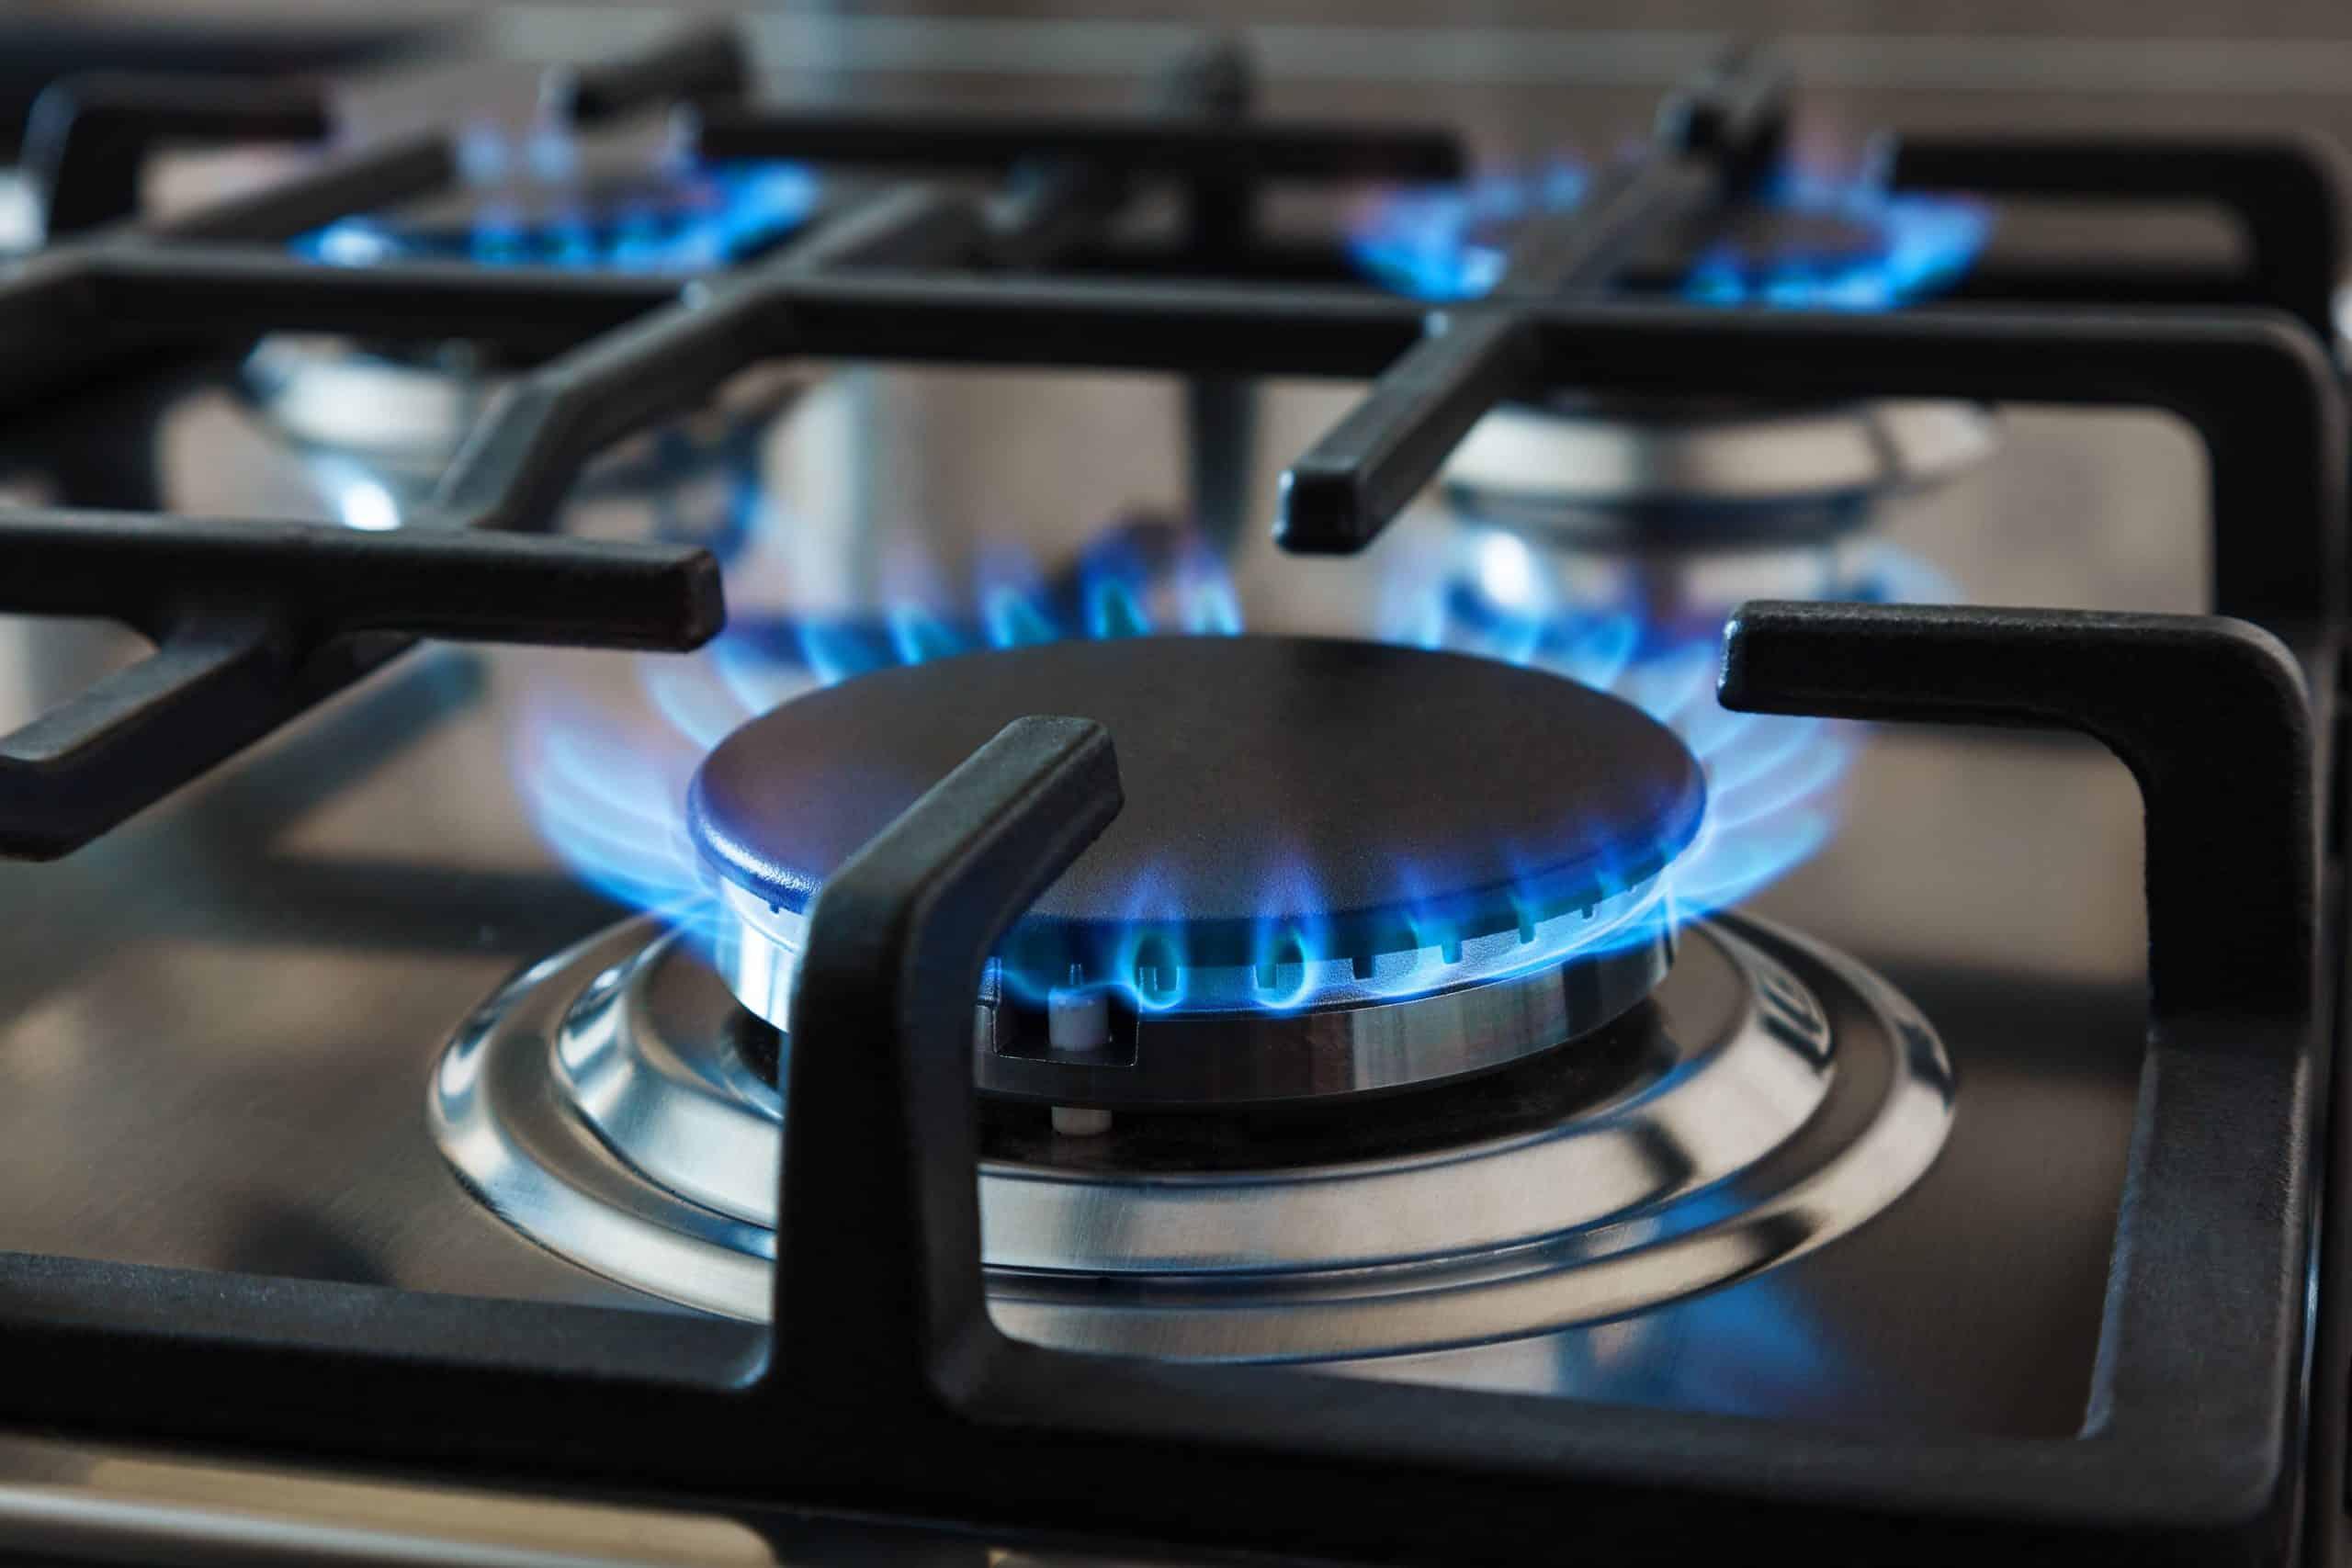 Gas burner on a stove